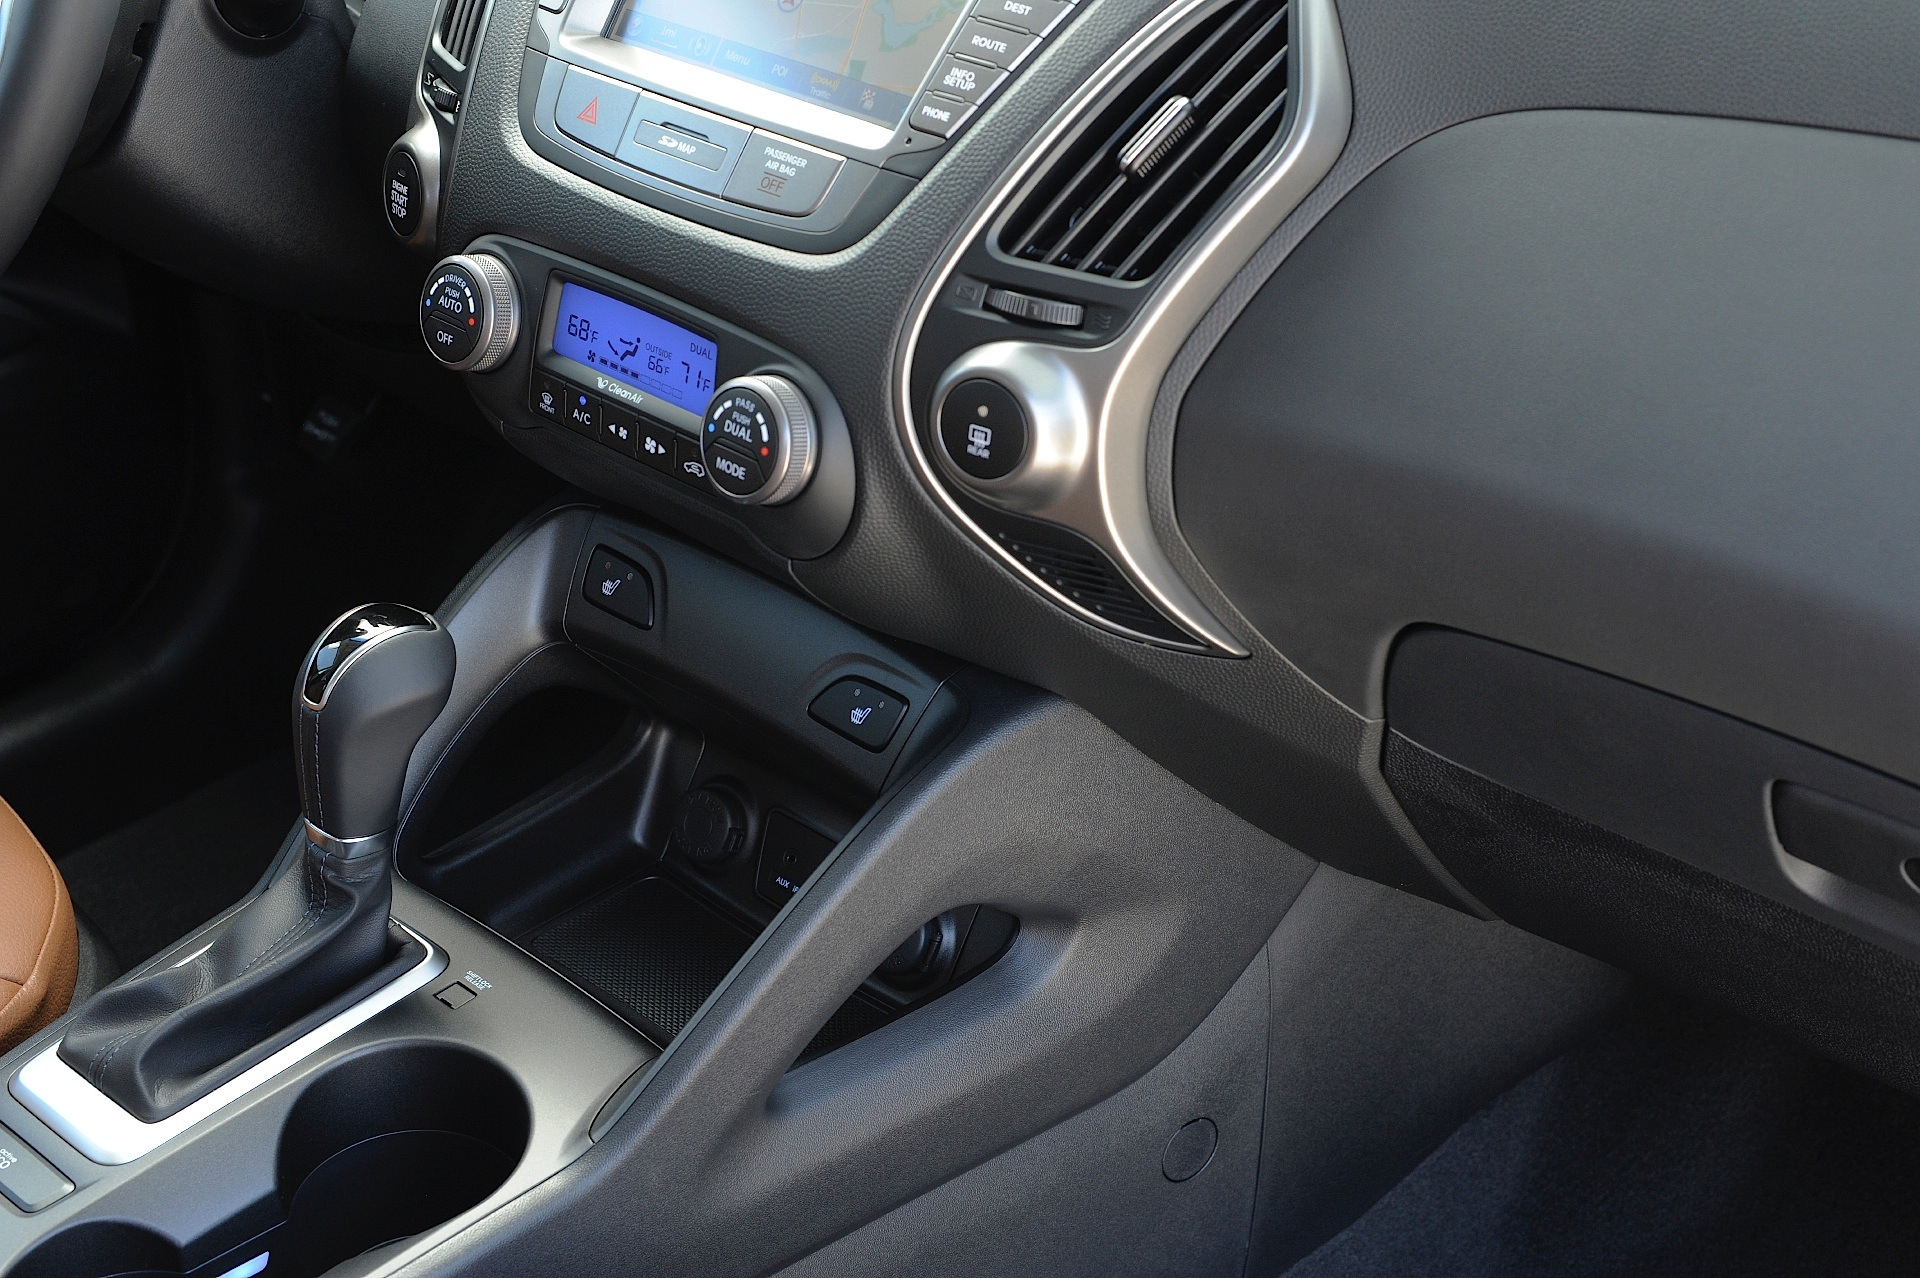 HYUNDAI ix35 / Tucson specs - 2013, 2014, 2015 - autoevolution